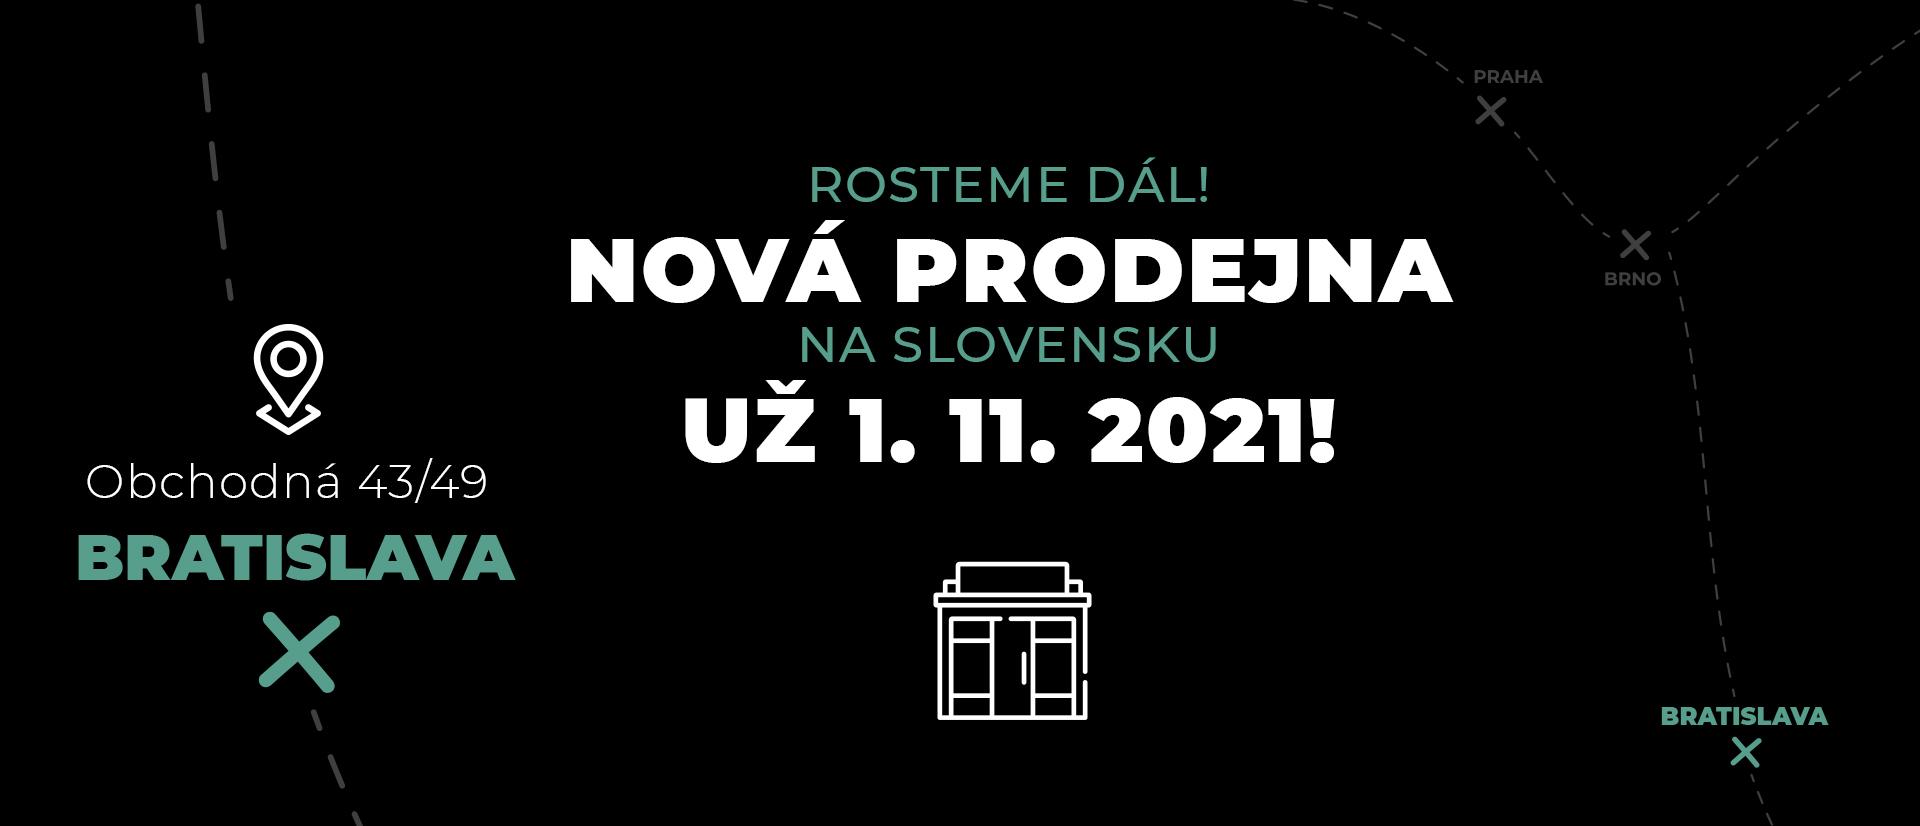 Nova prodejna Bratislava